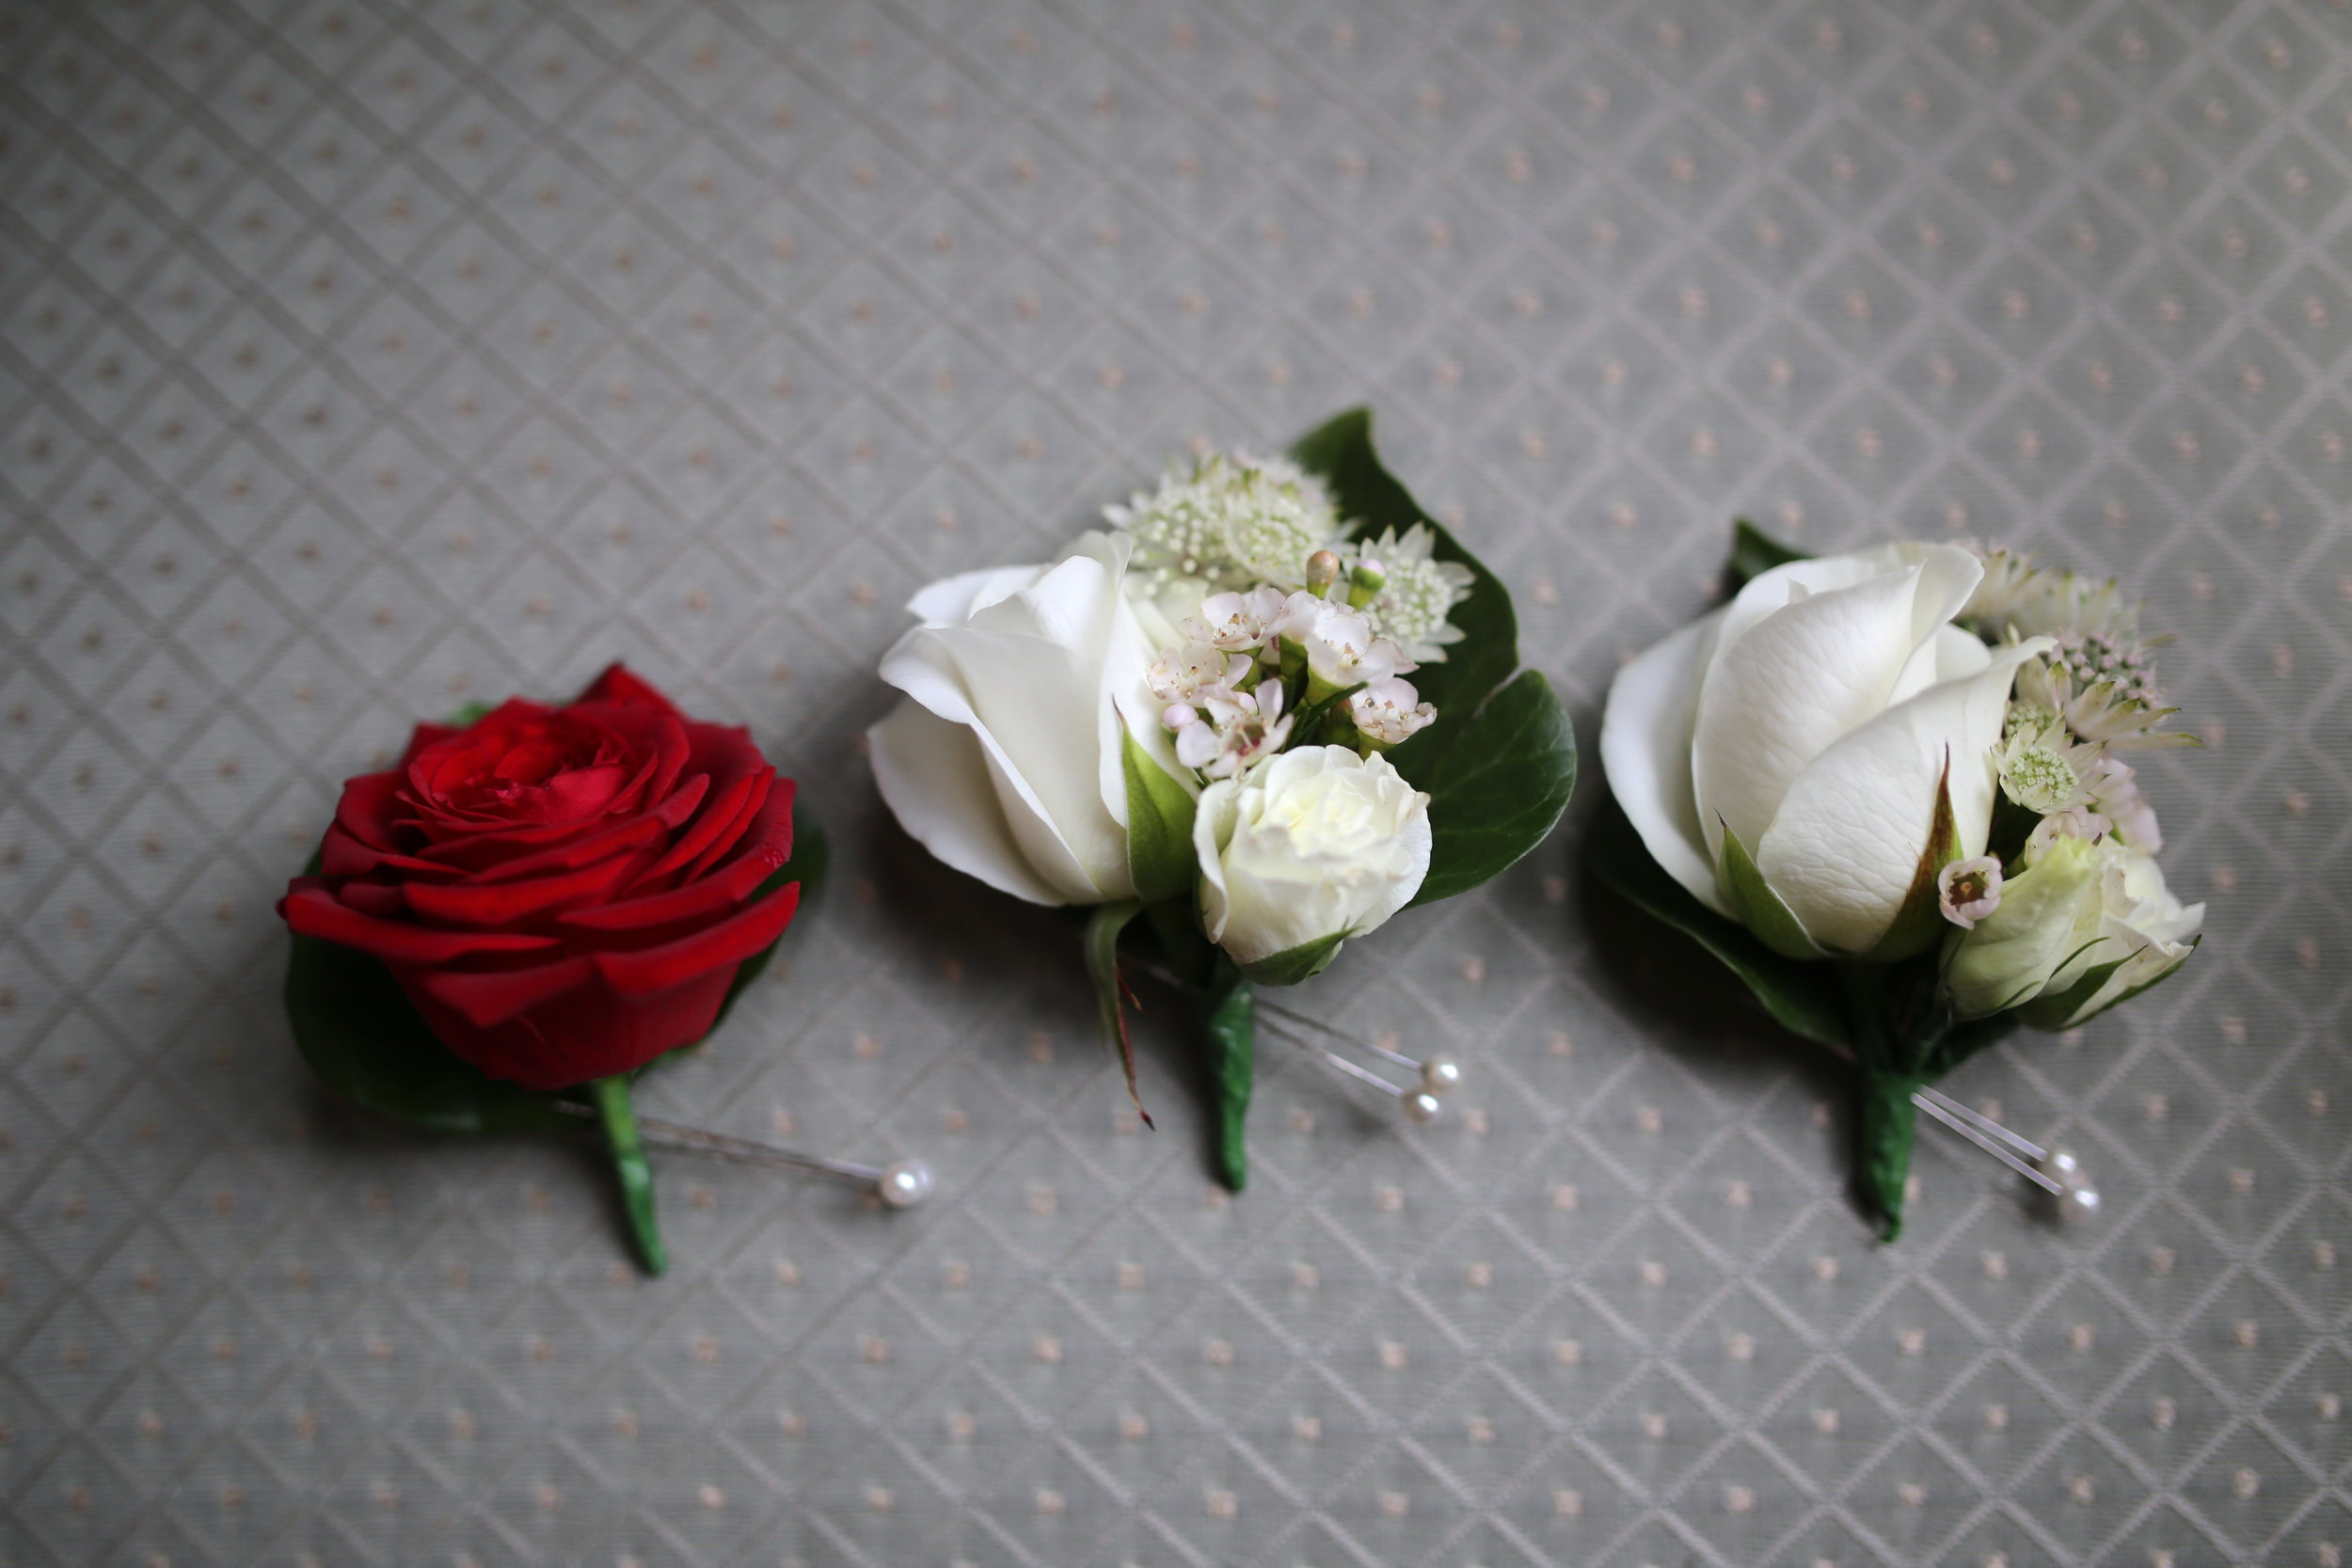 MIRIAM_FAITH_WEDDING_FLOWERS_CORSAGES_BUTTONHOLES_BOUTENIERS.JPG